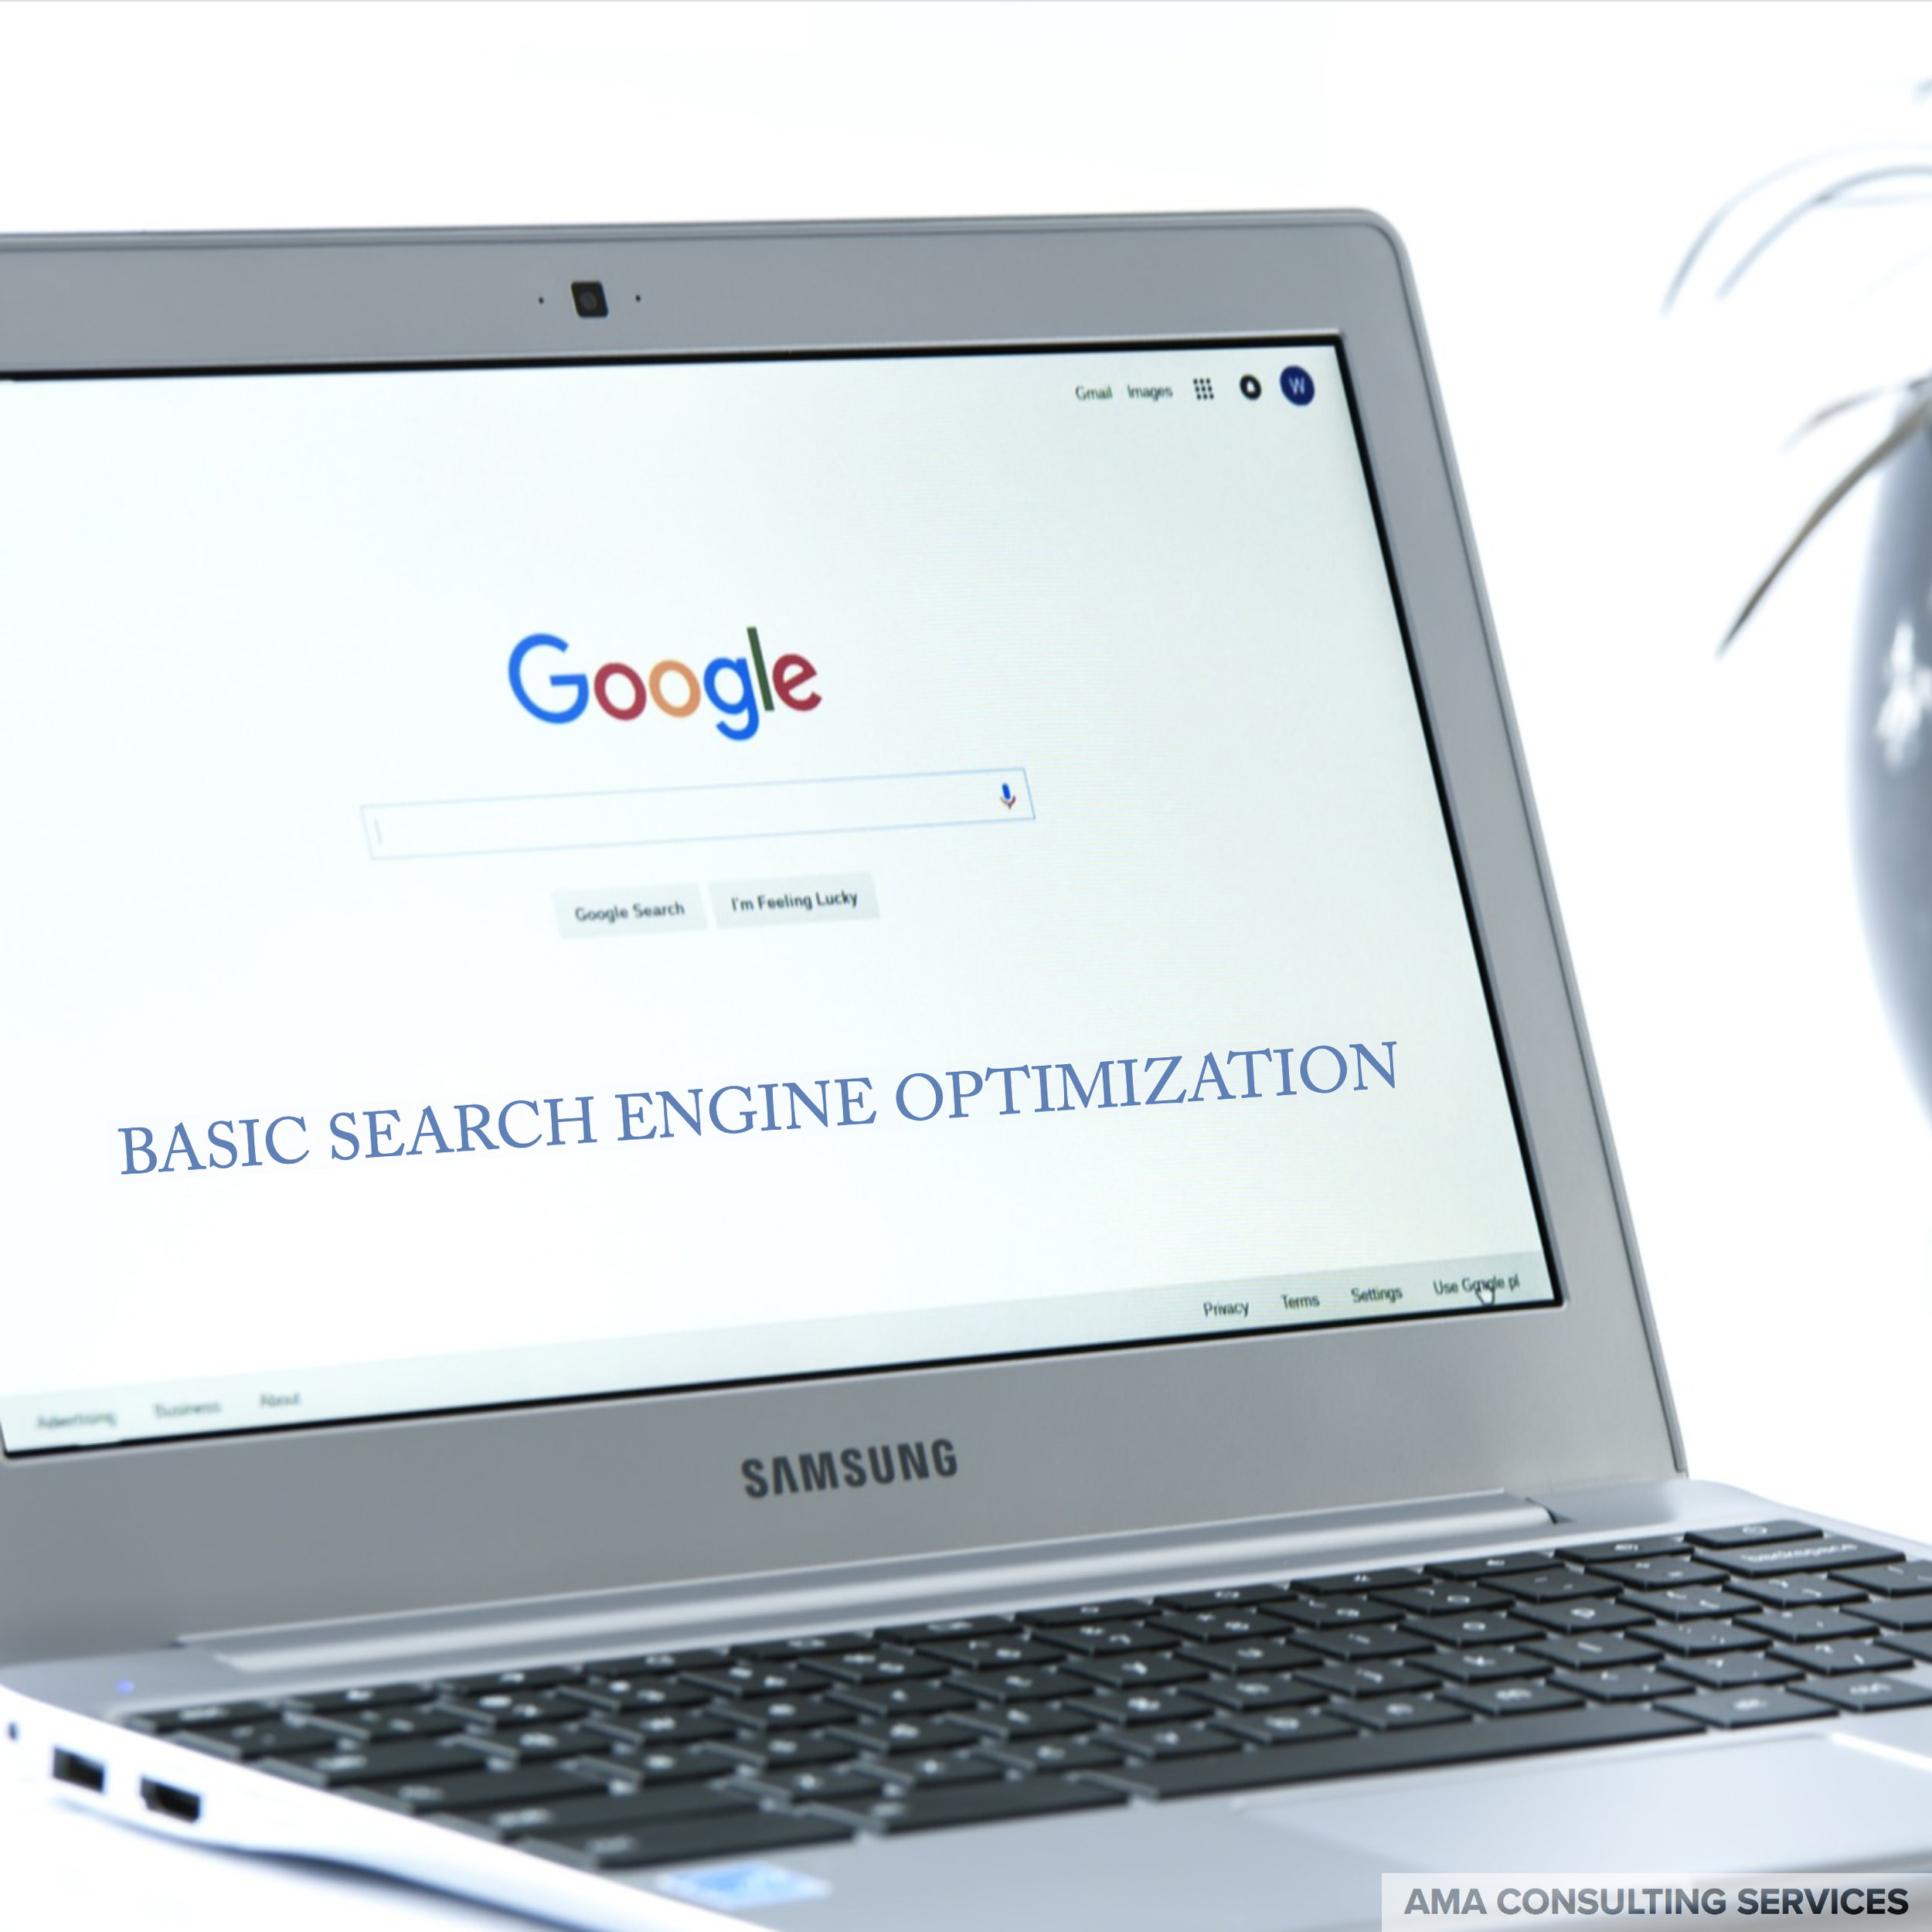 basic-search-engine-optimization.jpg